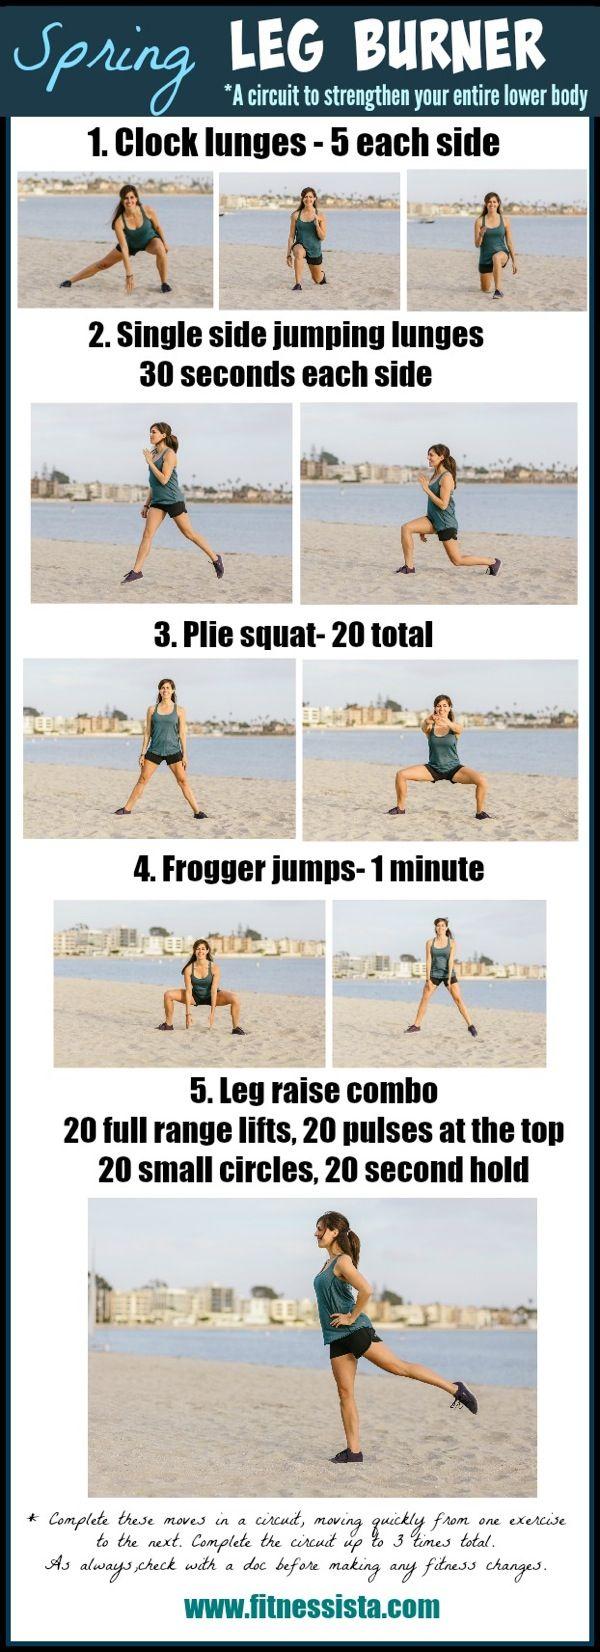 Spring leg burner. A killer leg workout you can do anywhere ...